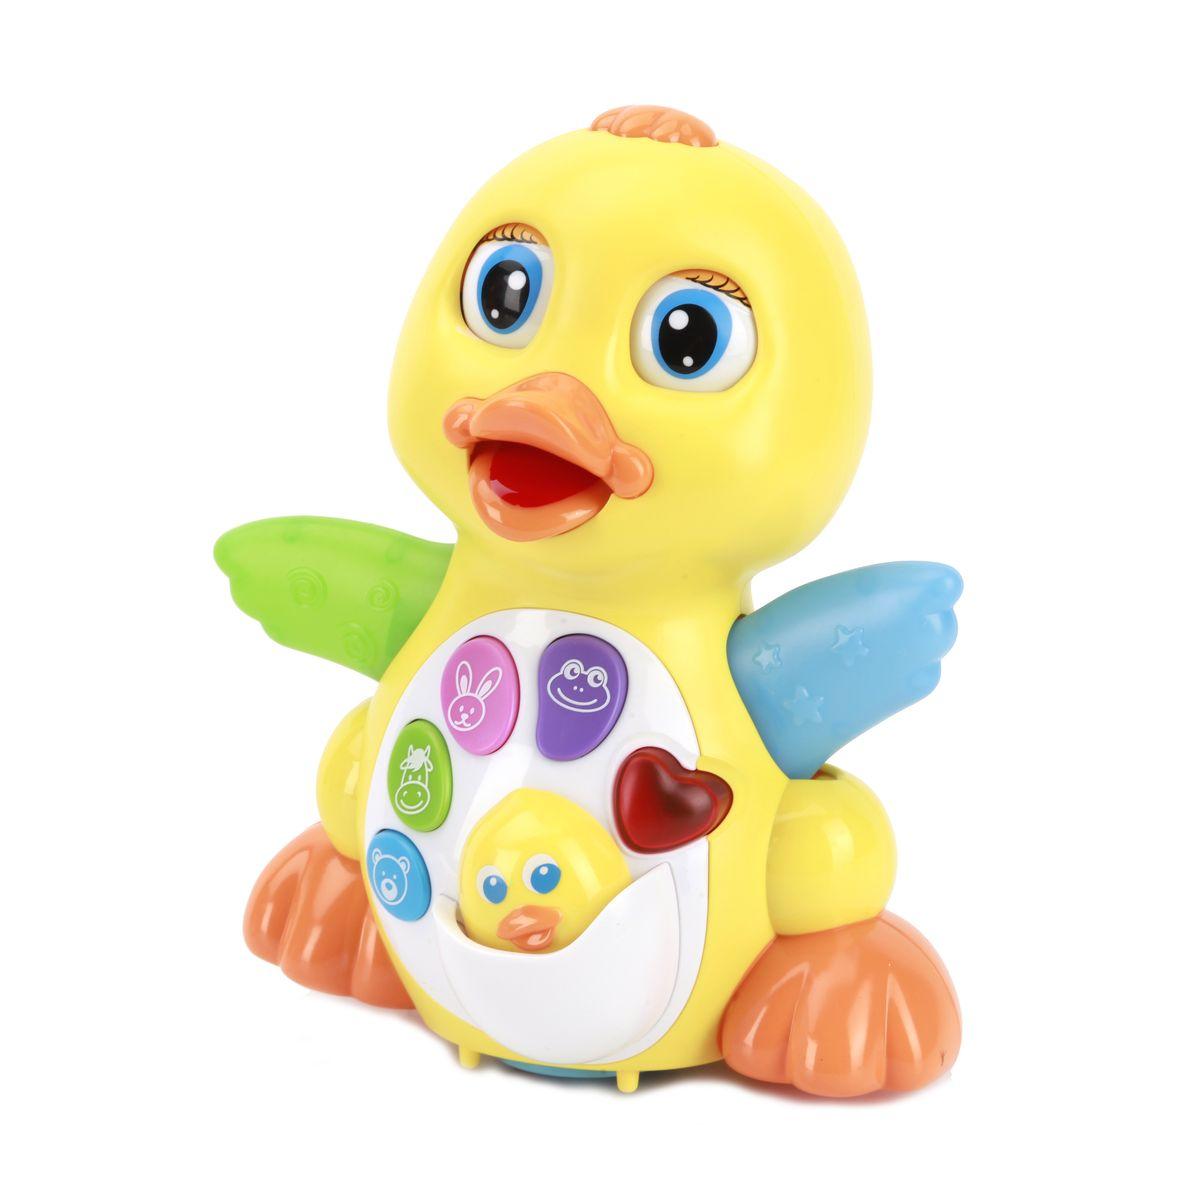 Музыкальная игрушка Умка B655-H04018RU